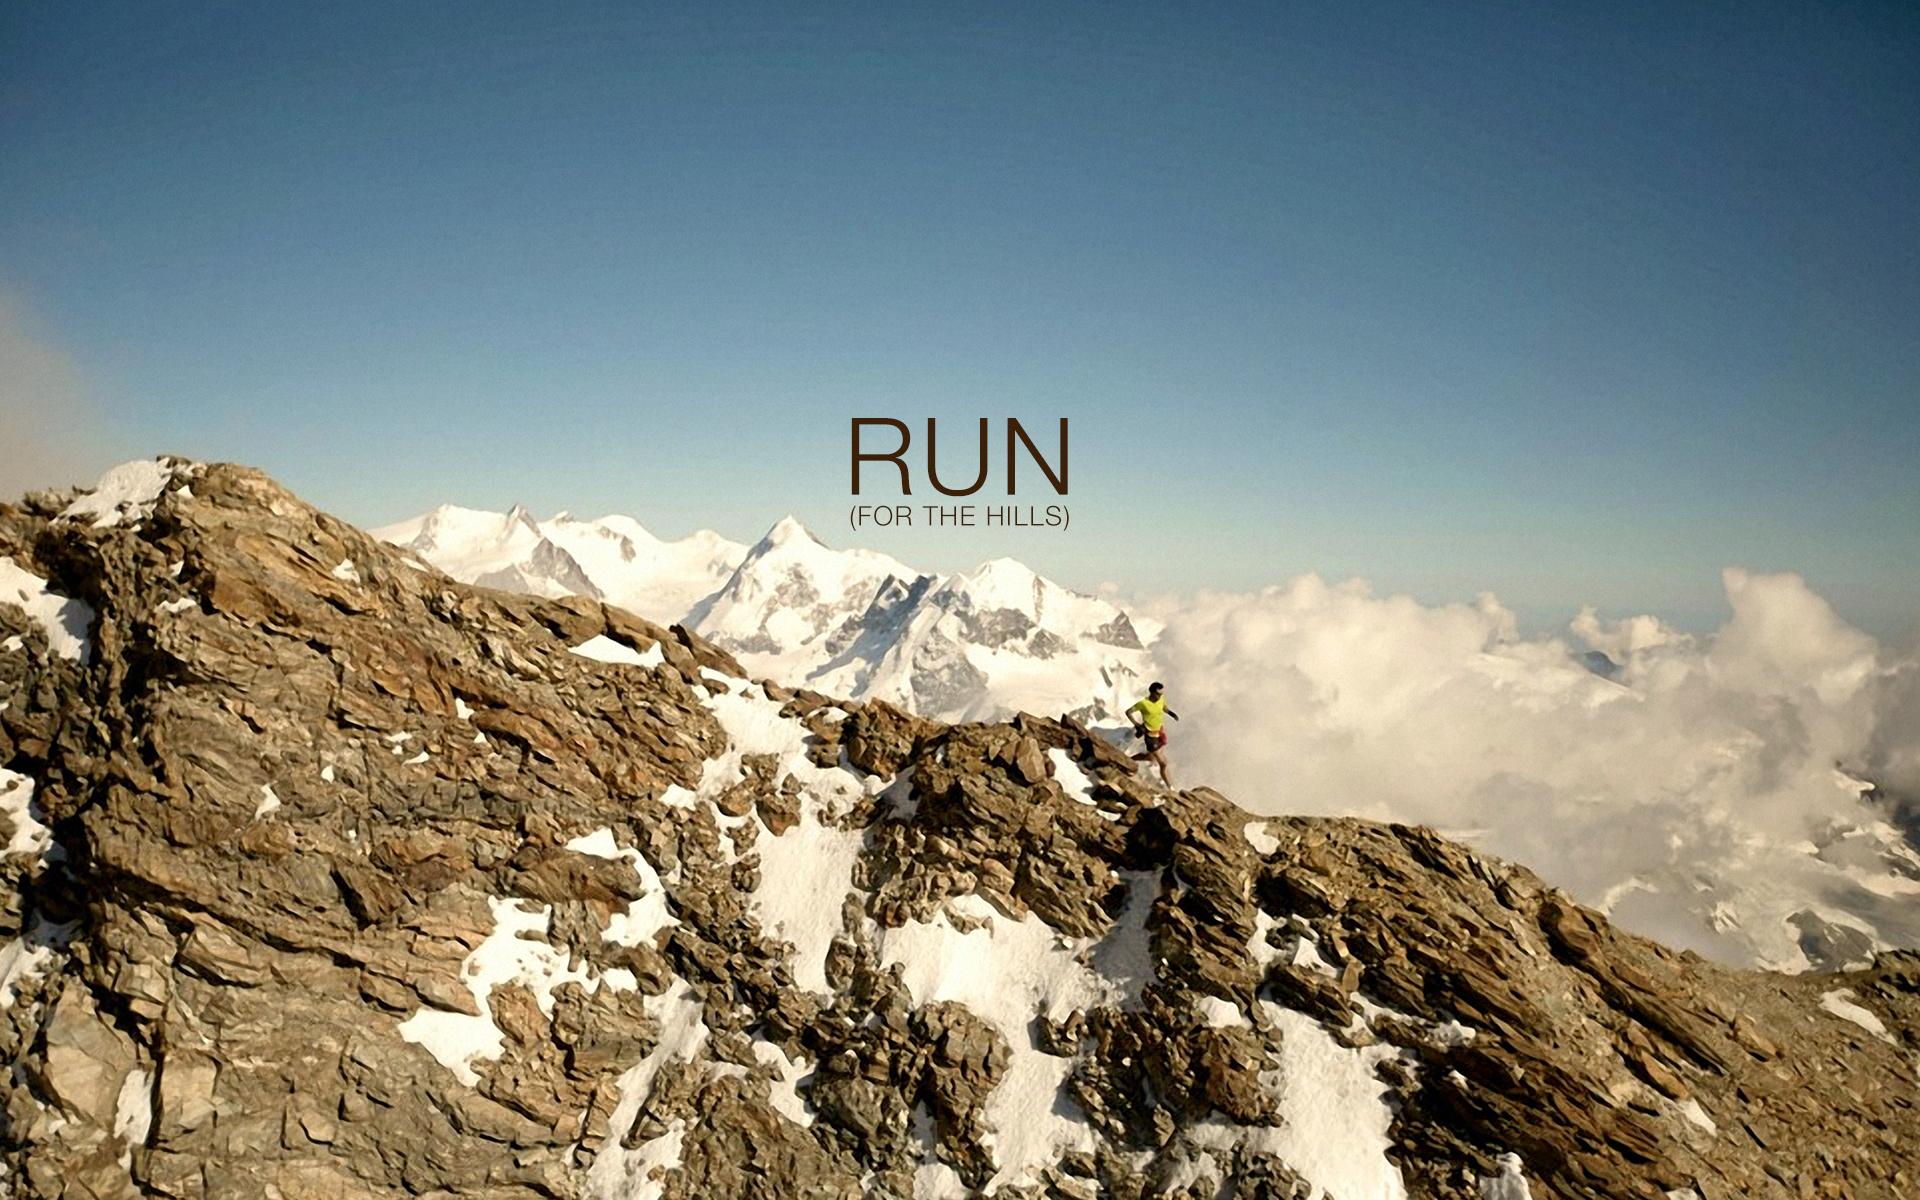 Run for the Hills Wallpaper